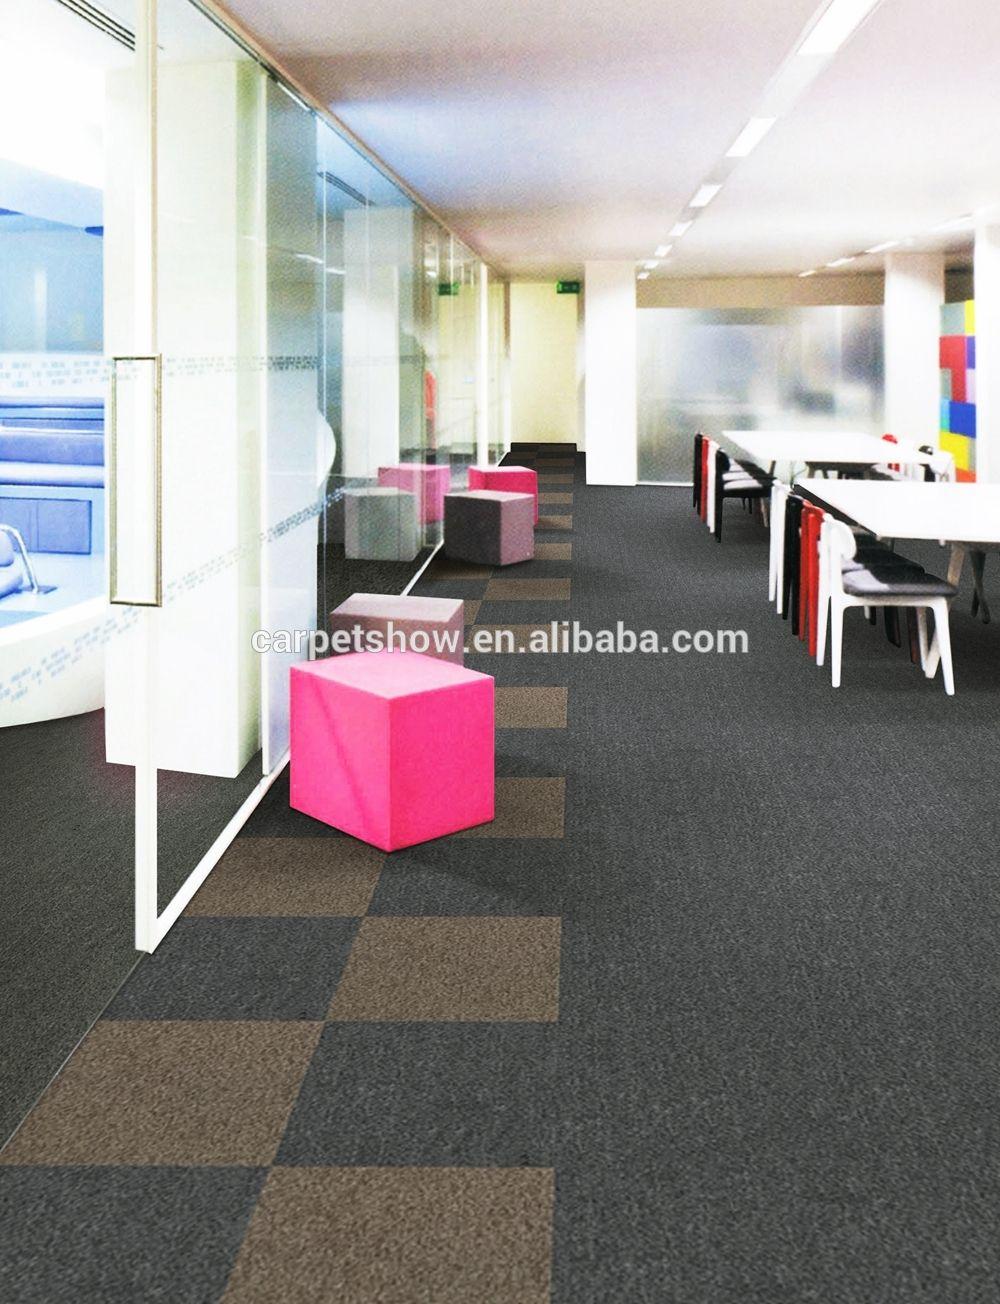 Rug carpet tile wholesale carpet tiles georgia rug and related post of wholesale carpet tiles georgia click image to download baanklon Choice Image